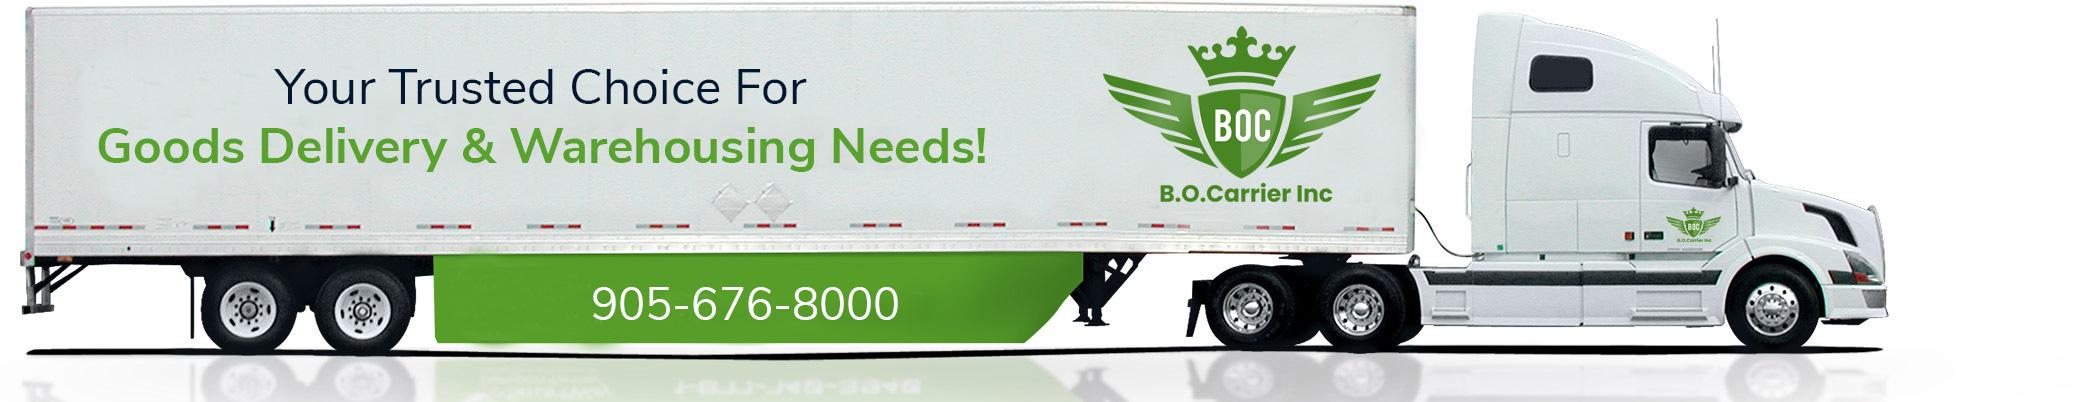 home-truck-greens